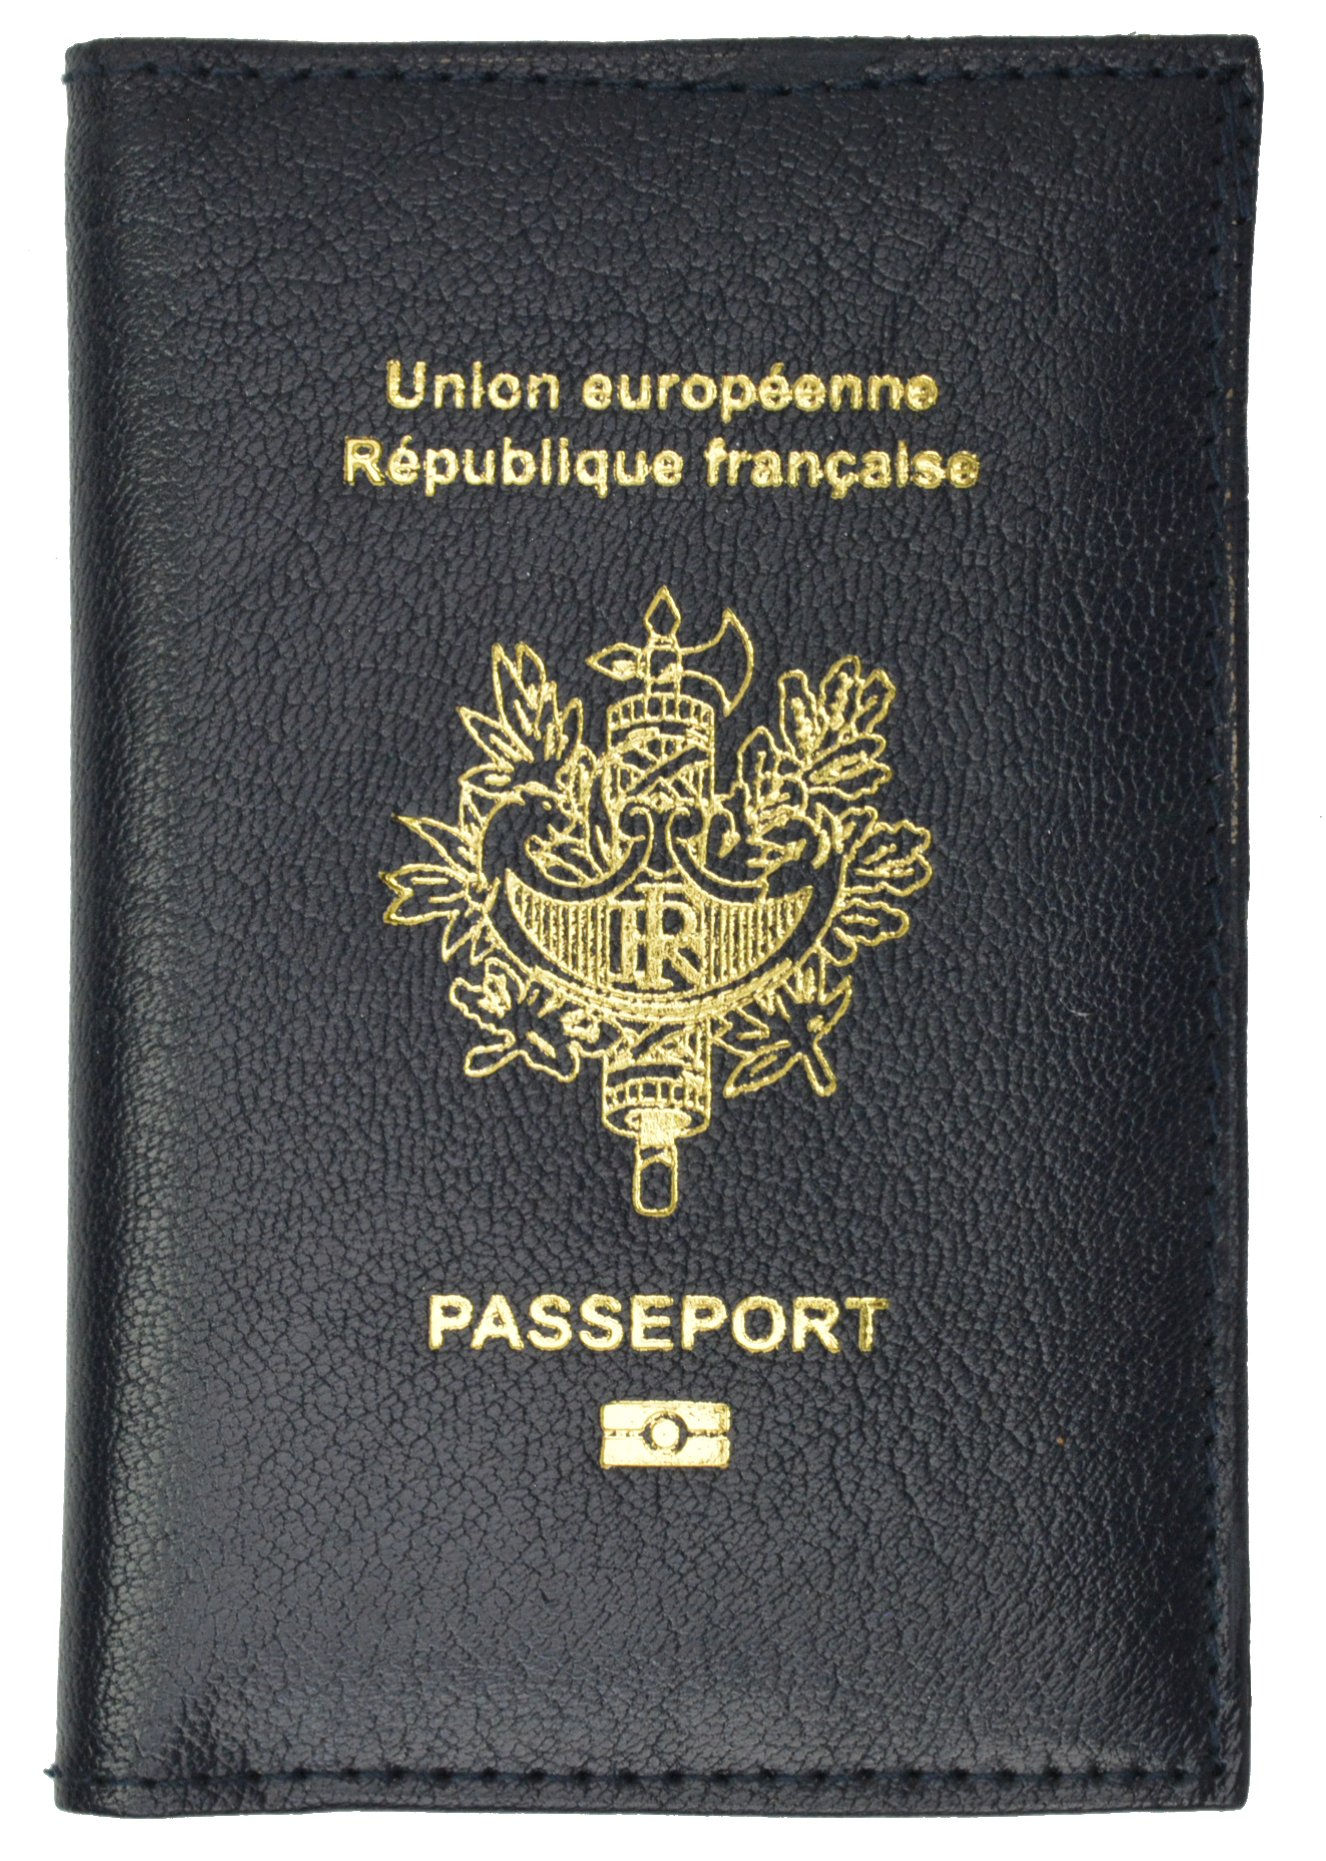 France Passport Cover Genuine Leather Passport Holder Travel Wallet REPUBLIQUE FRANCAISE (Blue)